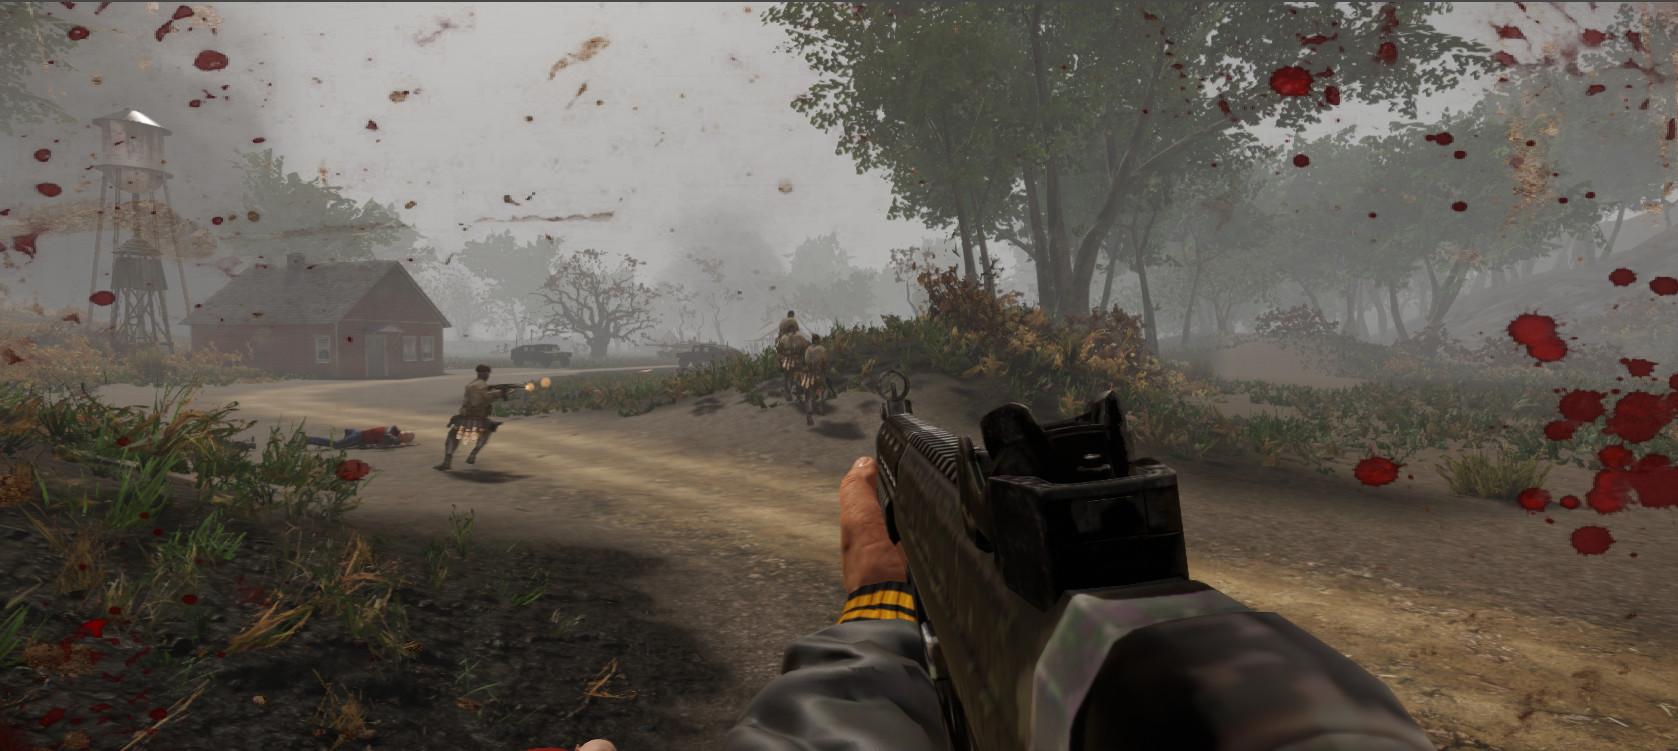 The Warrior War screenshot